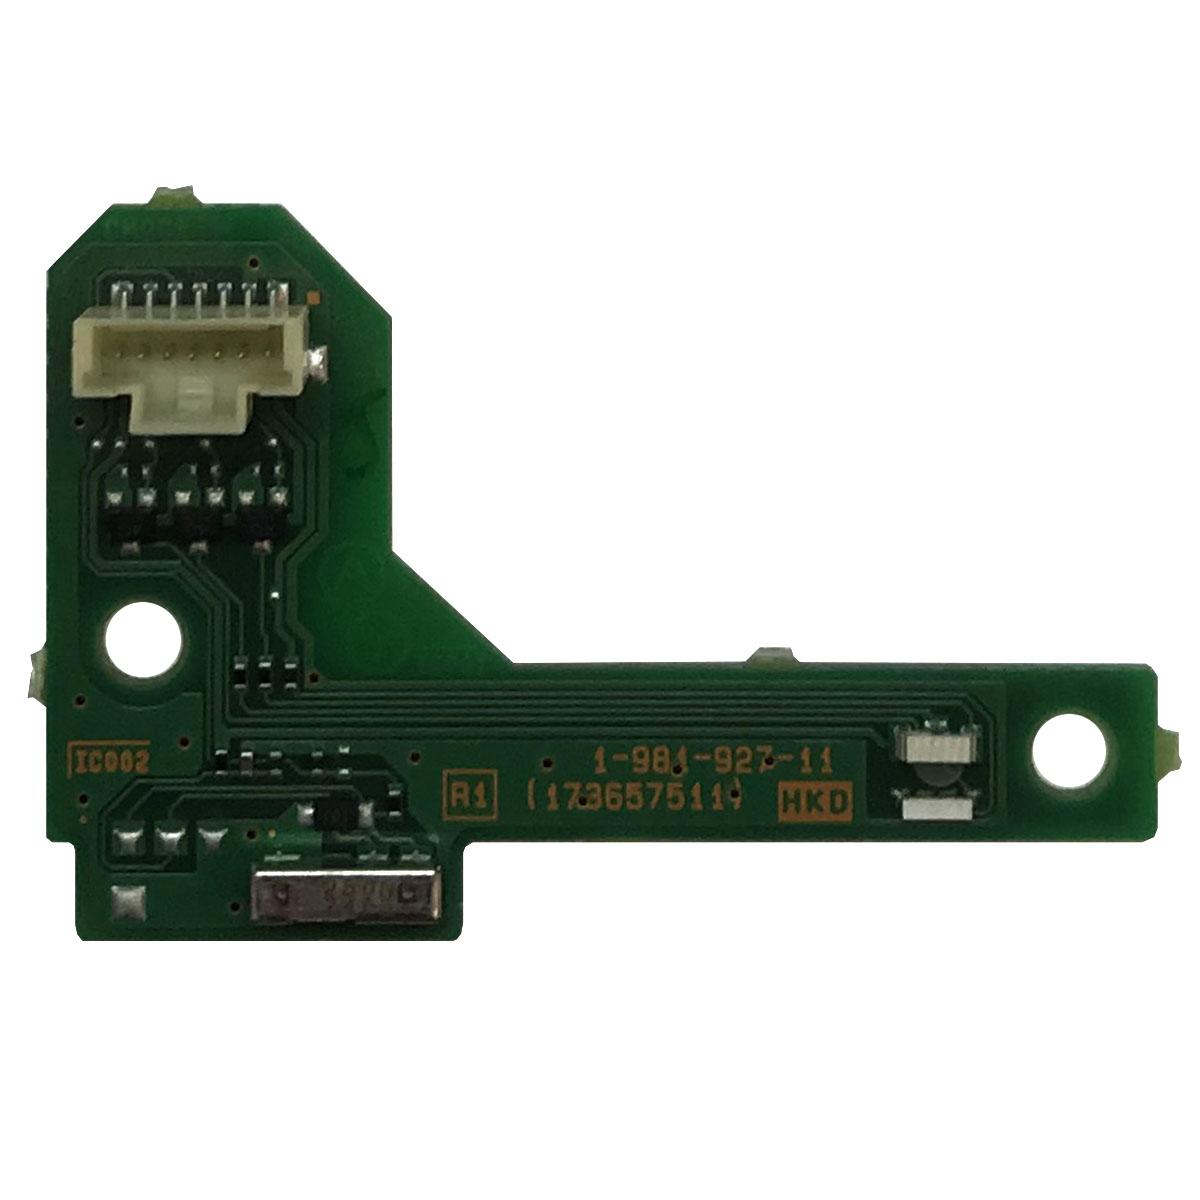 ИК-датчик 1-981-927-11 для SONY KDL-43WE755